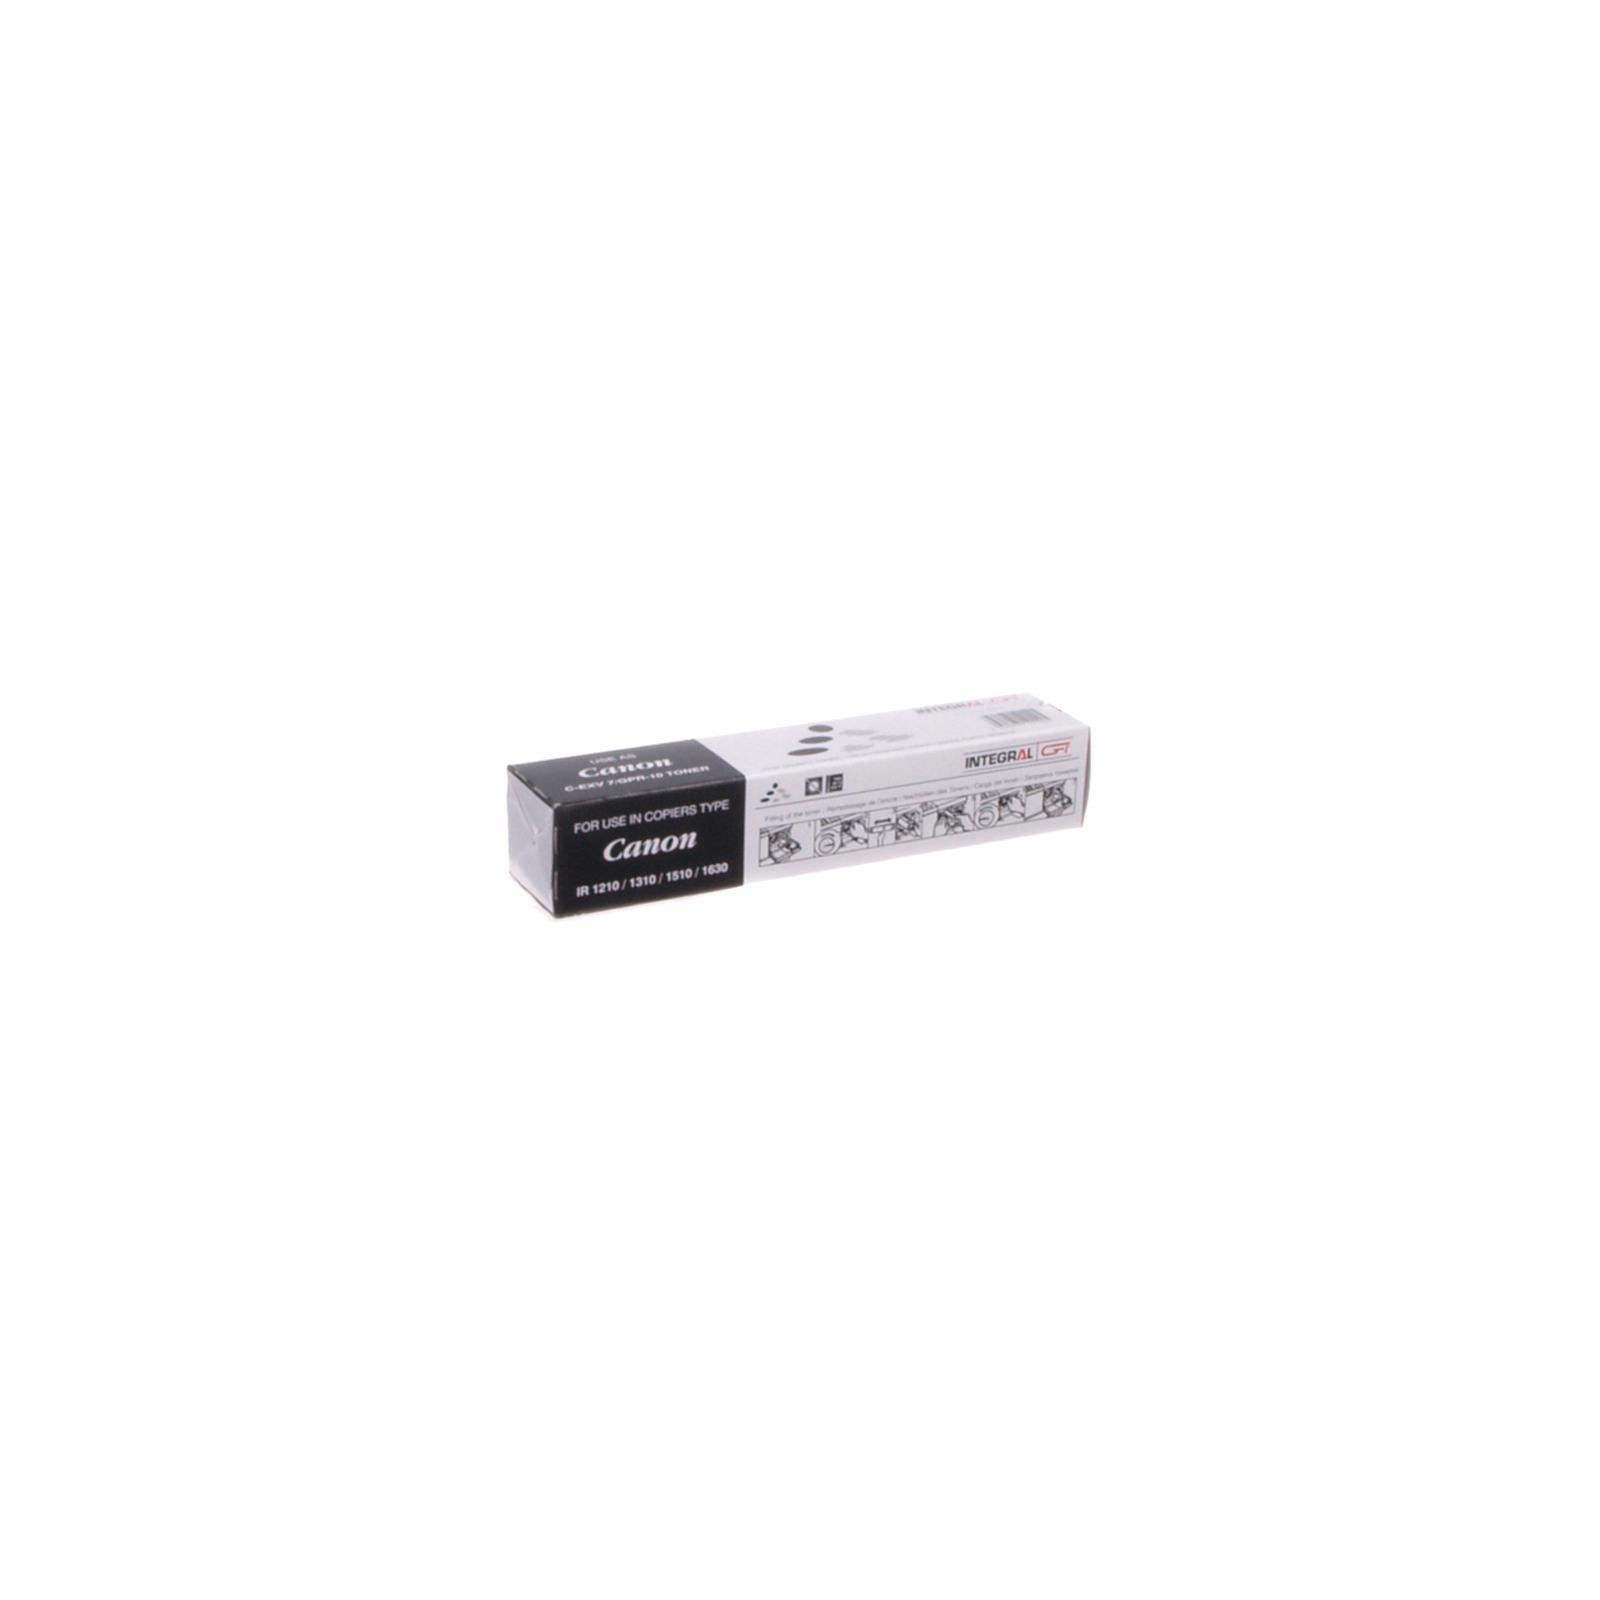 Тонер-картридж Canon C-EXV7 IR1200/1210/1510 (300г) Integral (11500067)